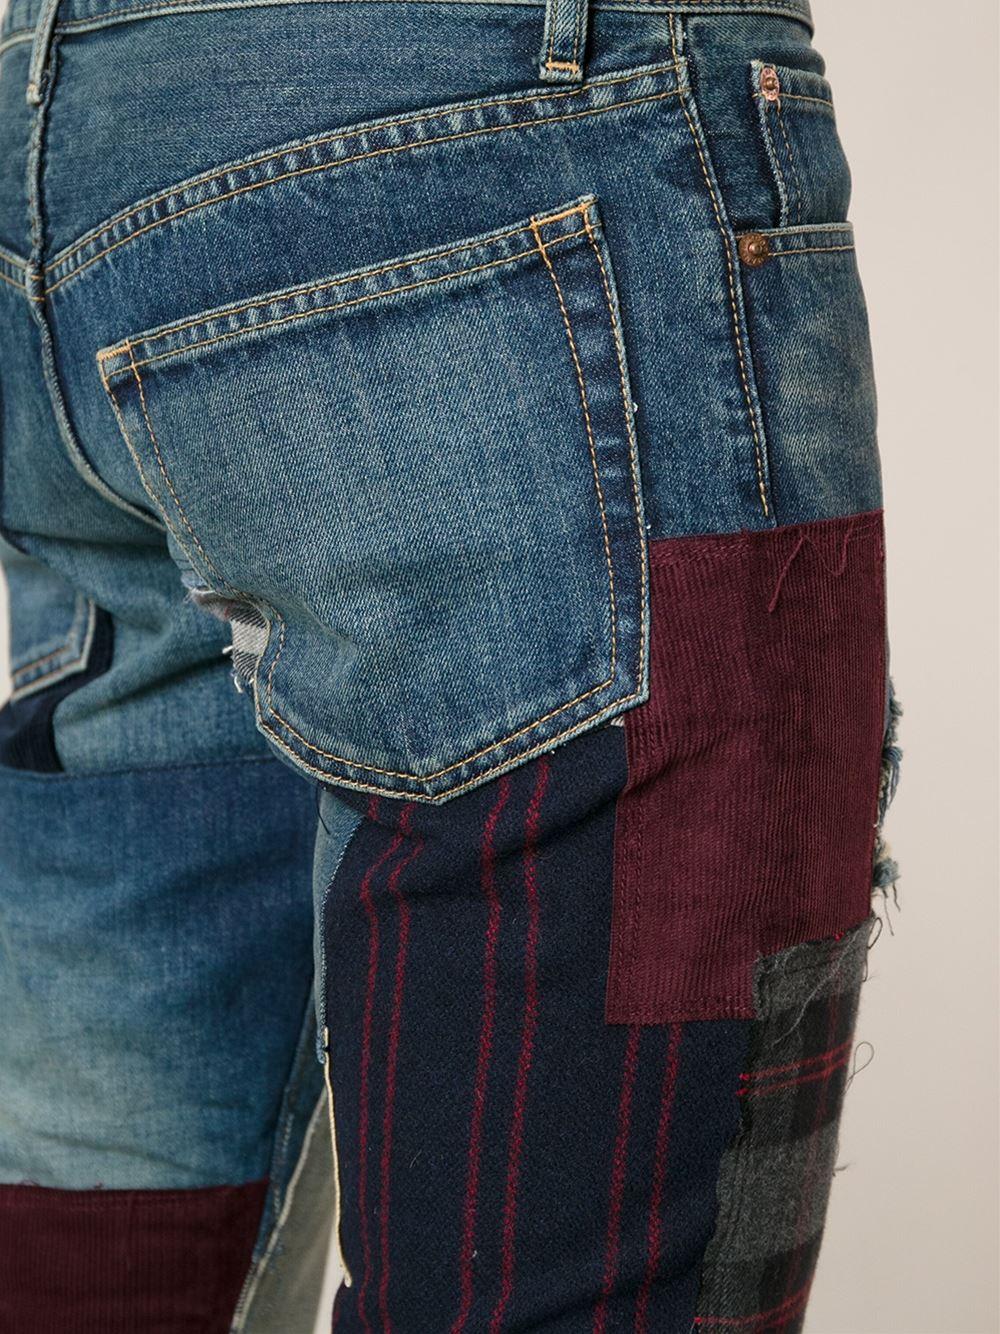 Lyst - Junya Watanabe Patchwork Straight Leg Jeans in Blue